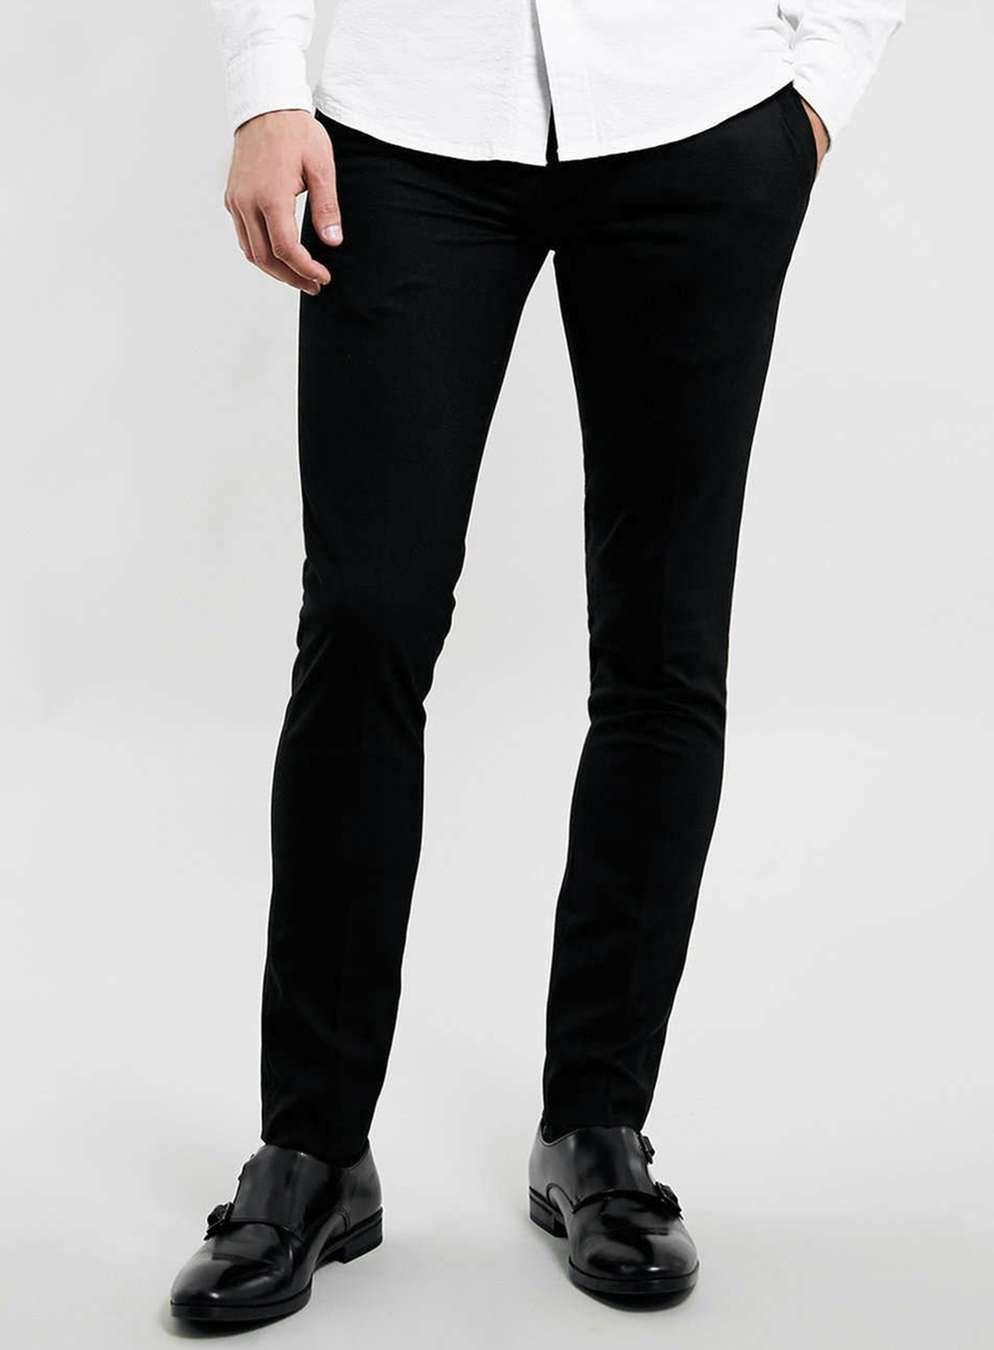 Black Ultra Skinny Fit Dress Pants | Skinny fit and Dress pants